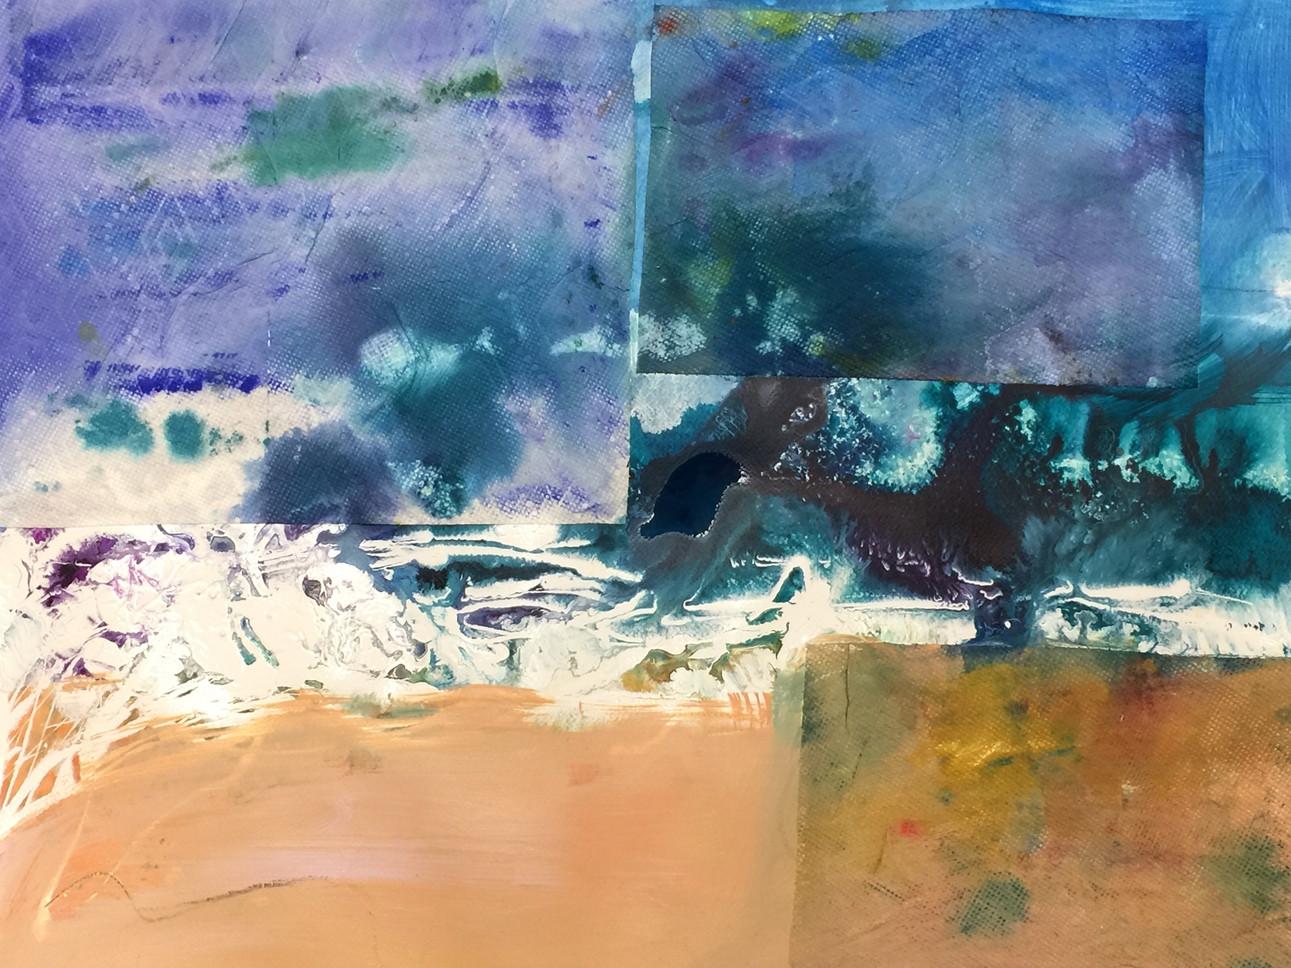 series#4 33cm x 56cm watercolor